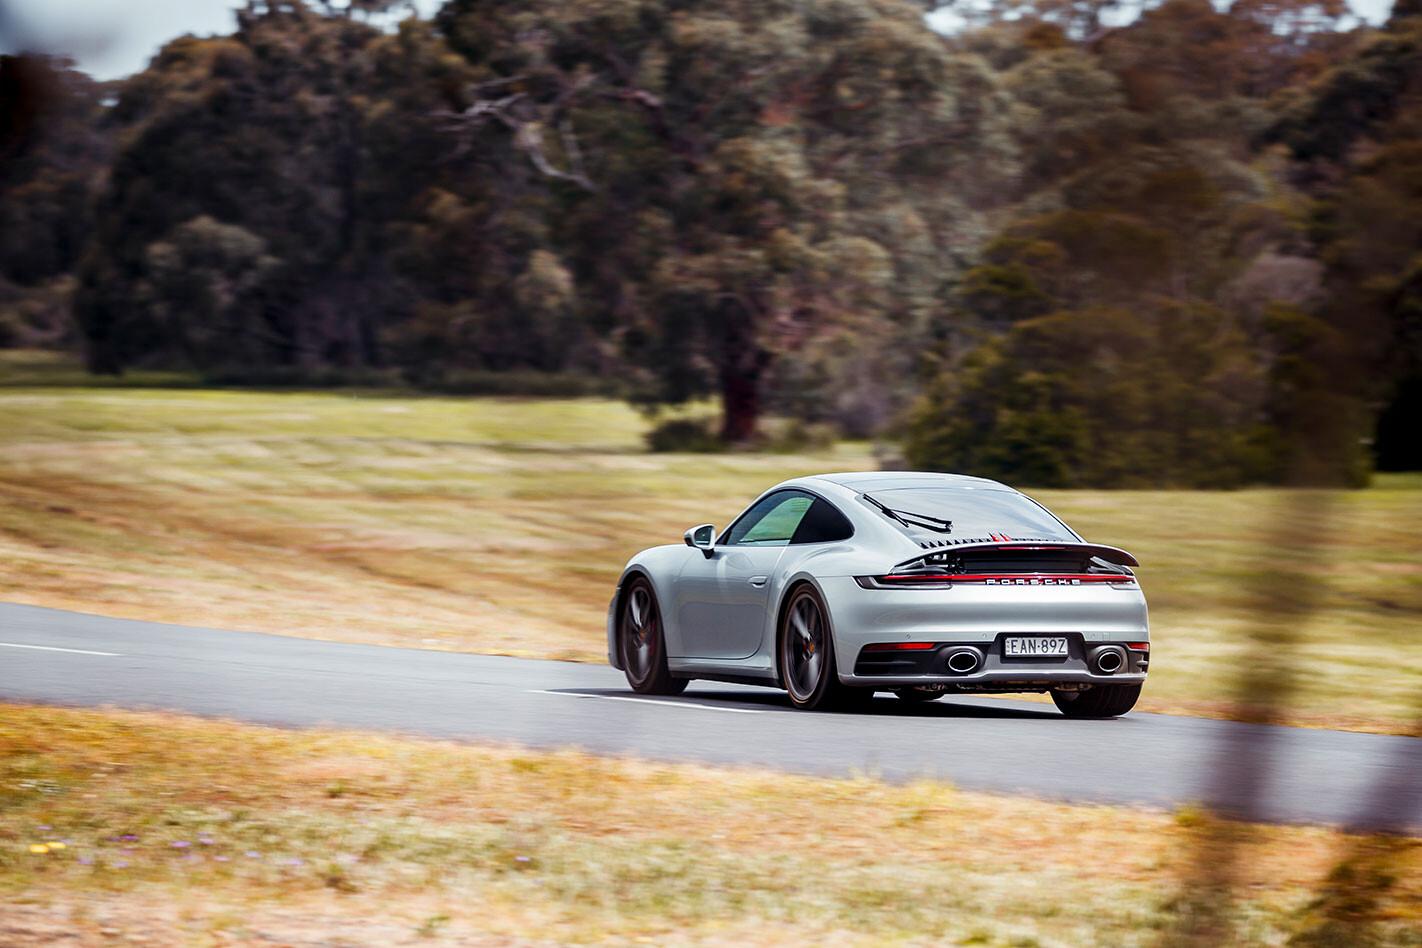 Car acceleration claims